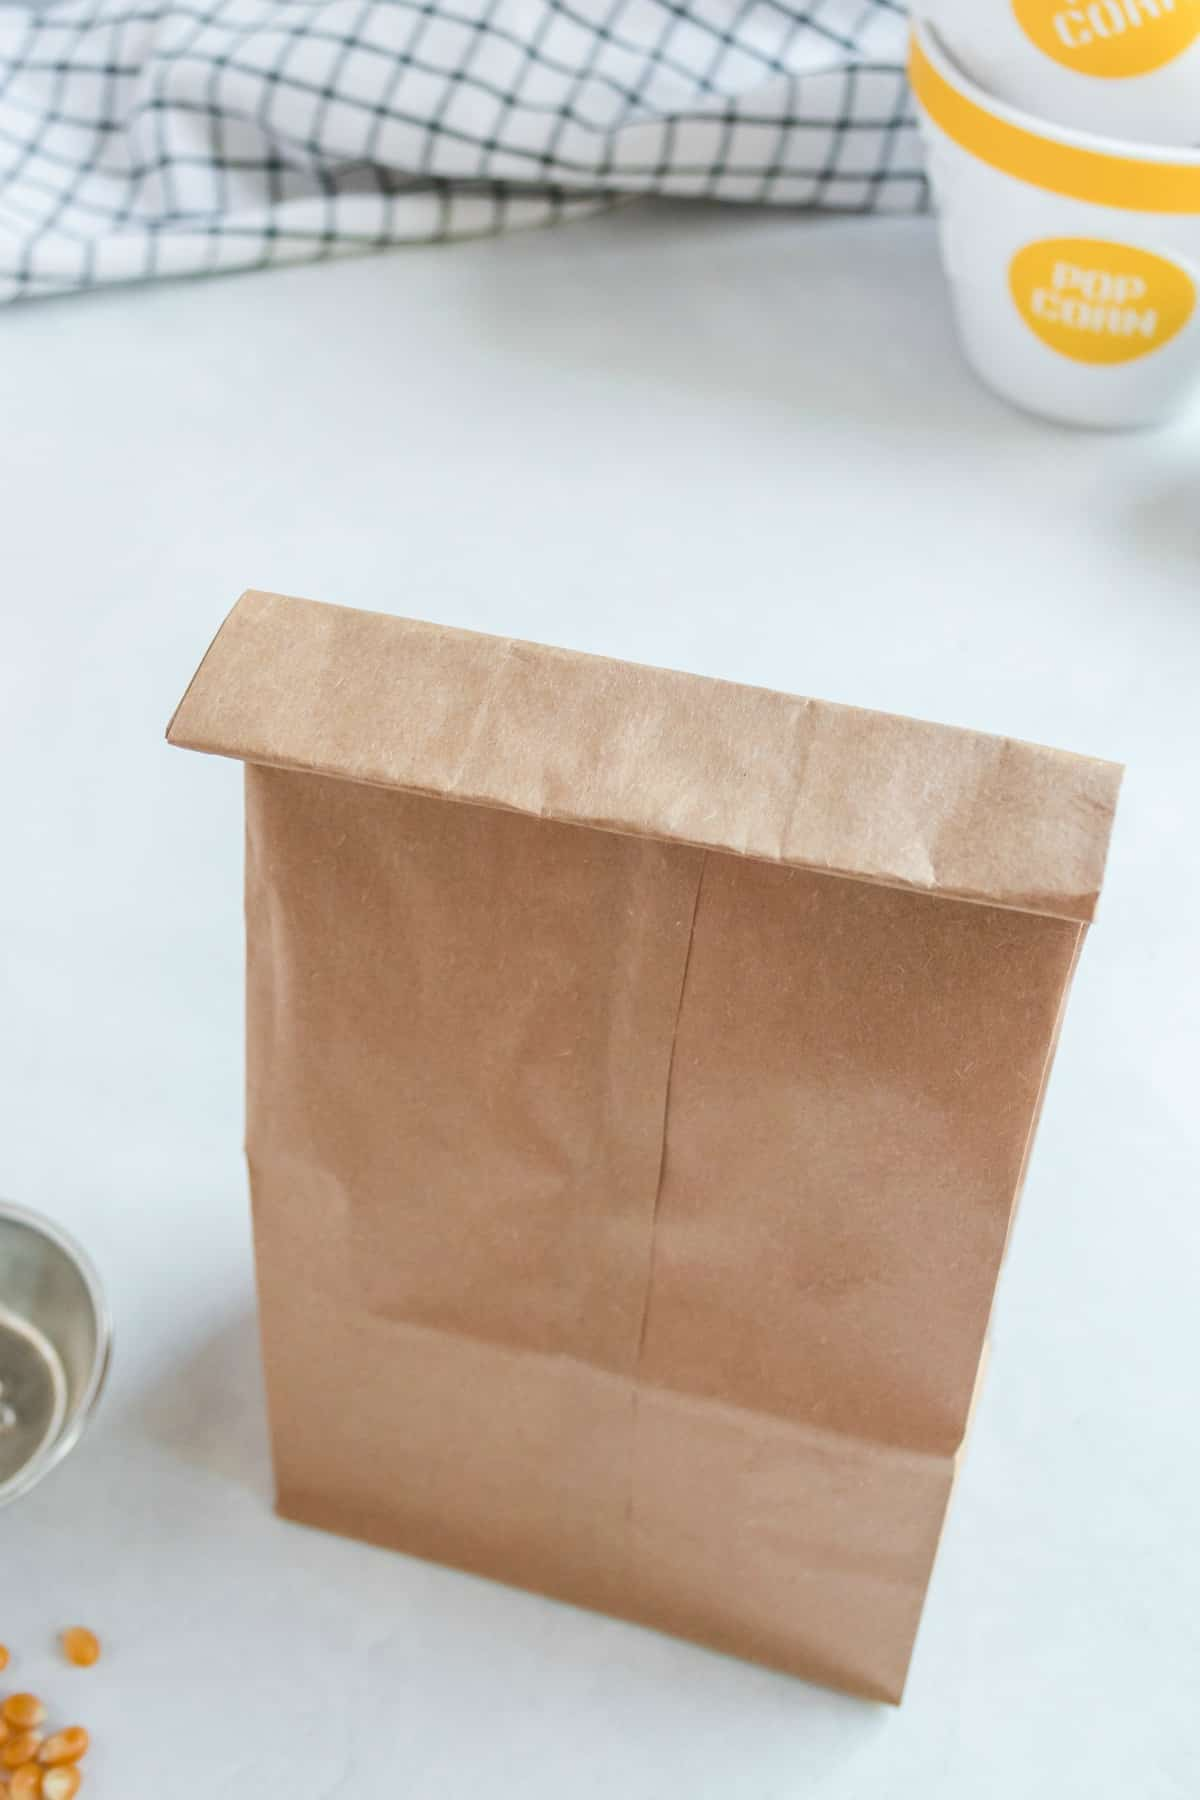 Brown paper bag folded over with popcorn inside.